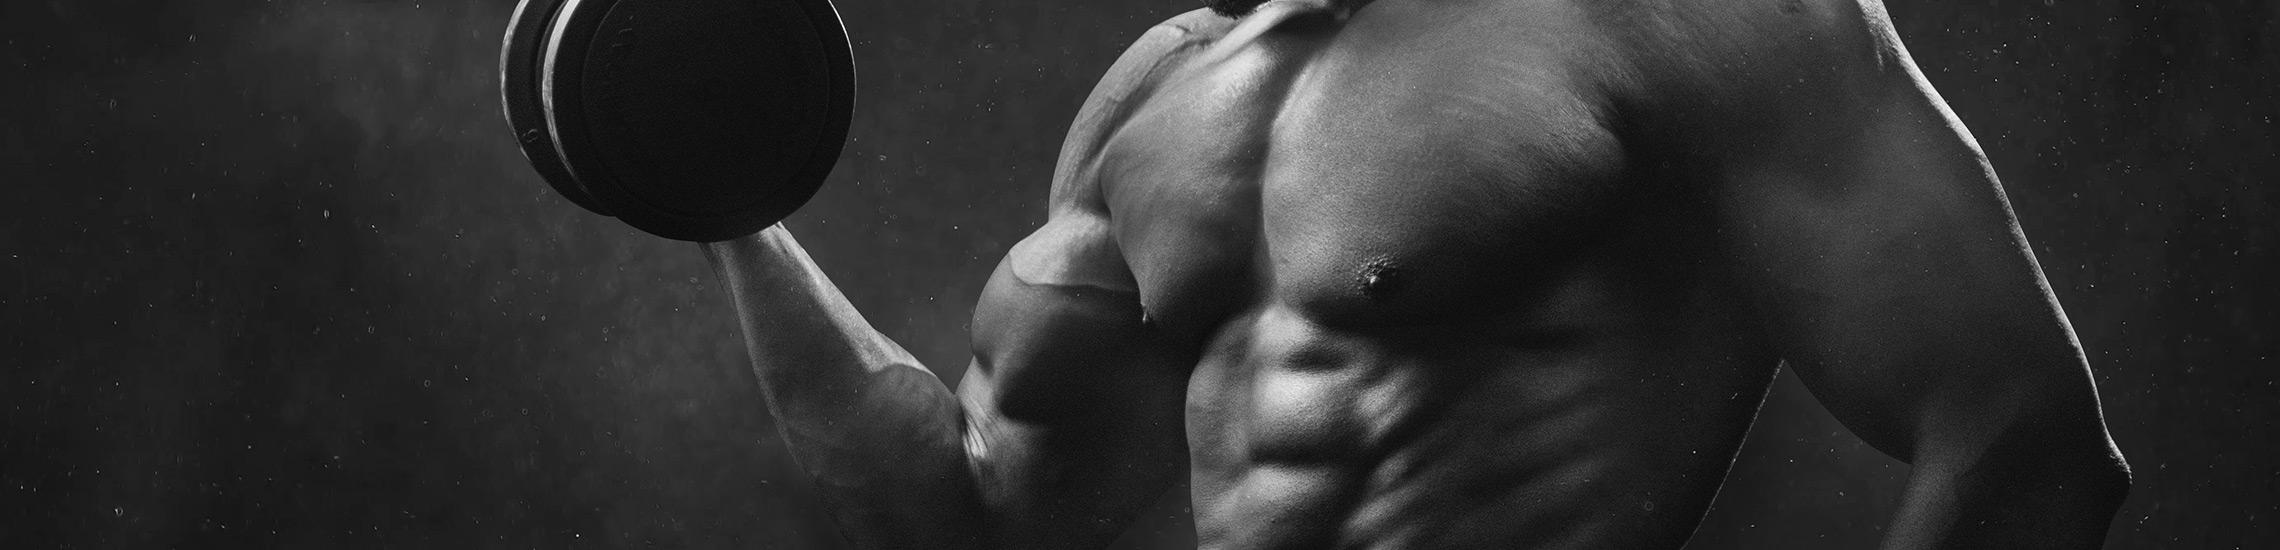 Dokterfun.com Fitness Posts